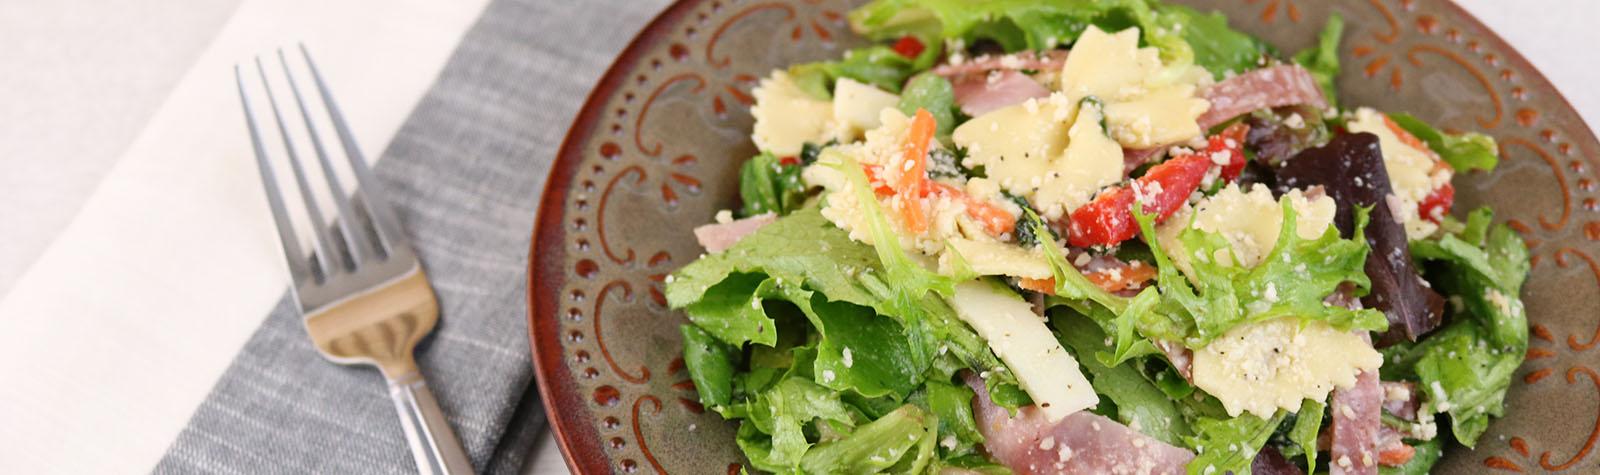 Garden Antipasto Salad